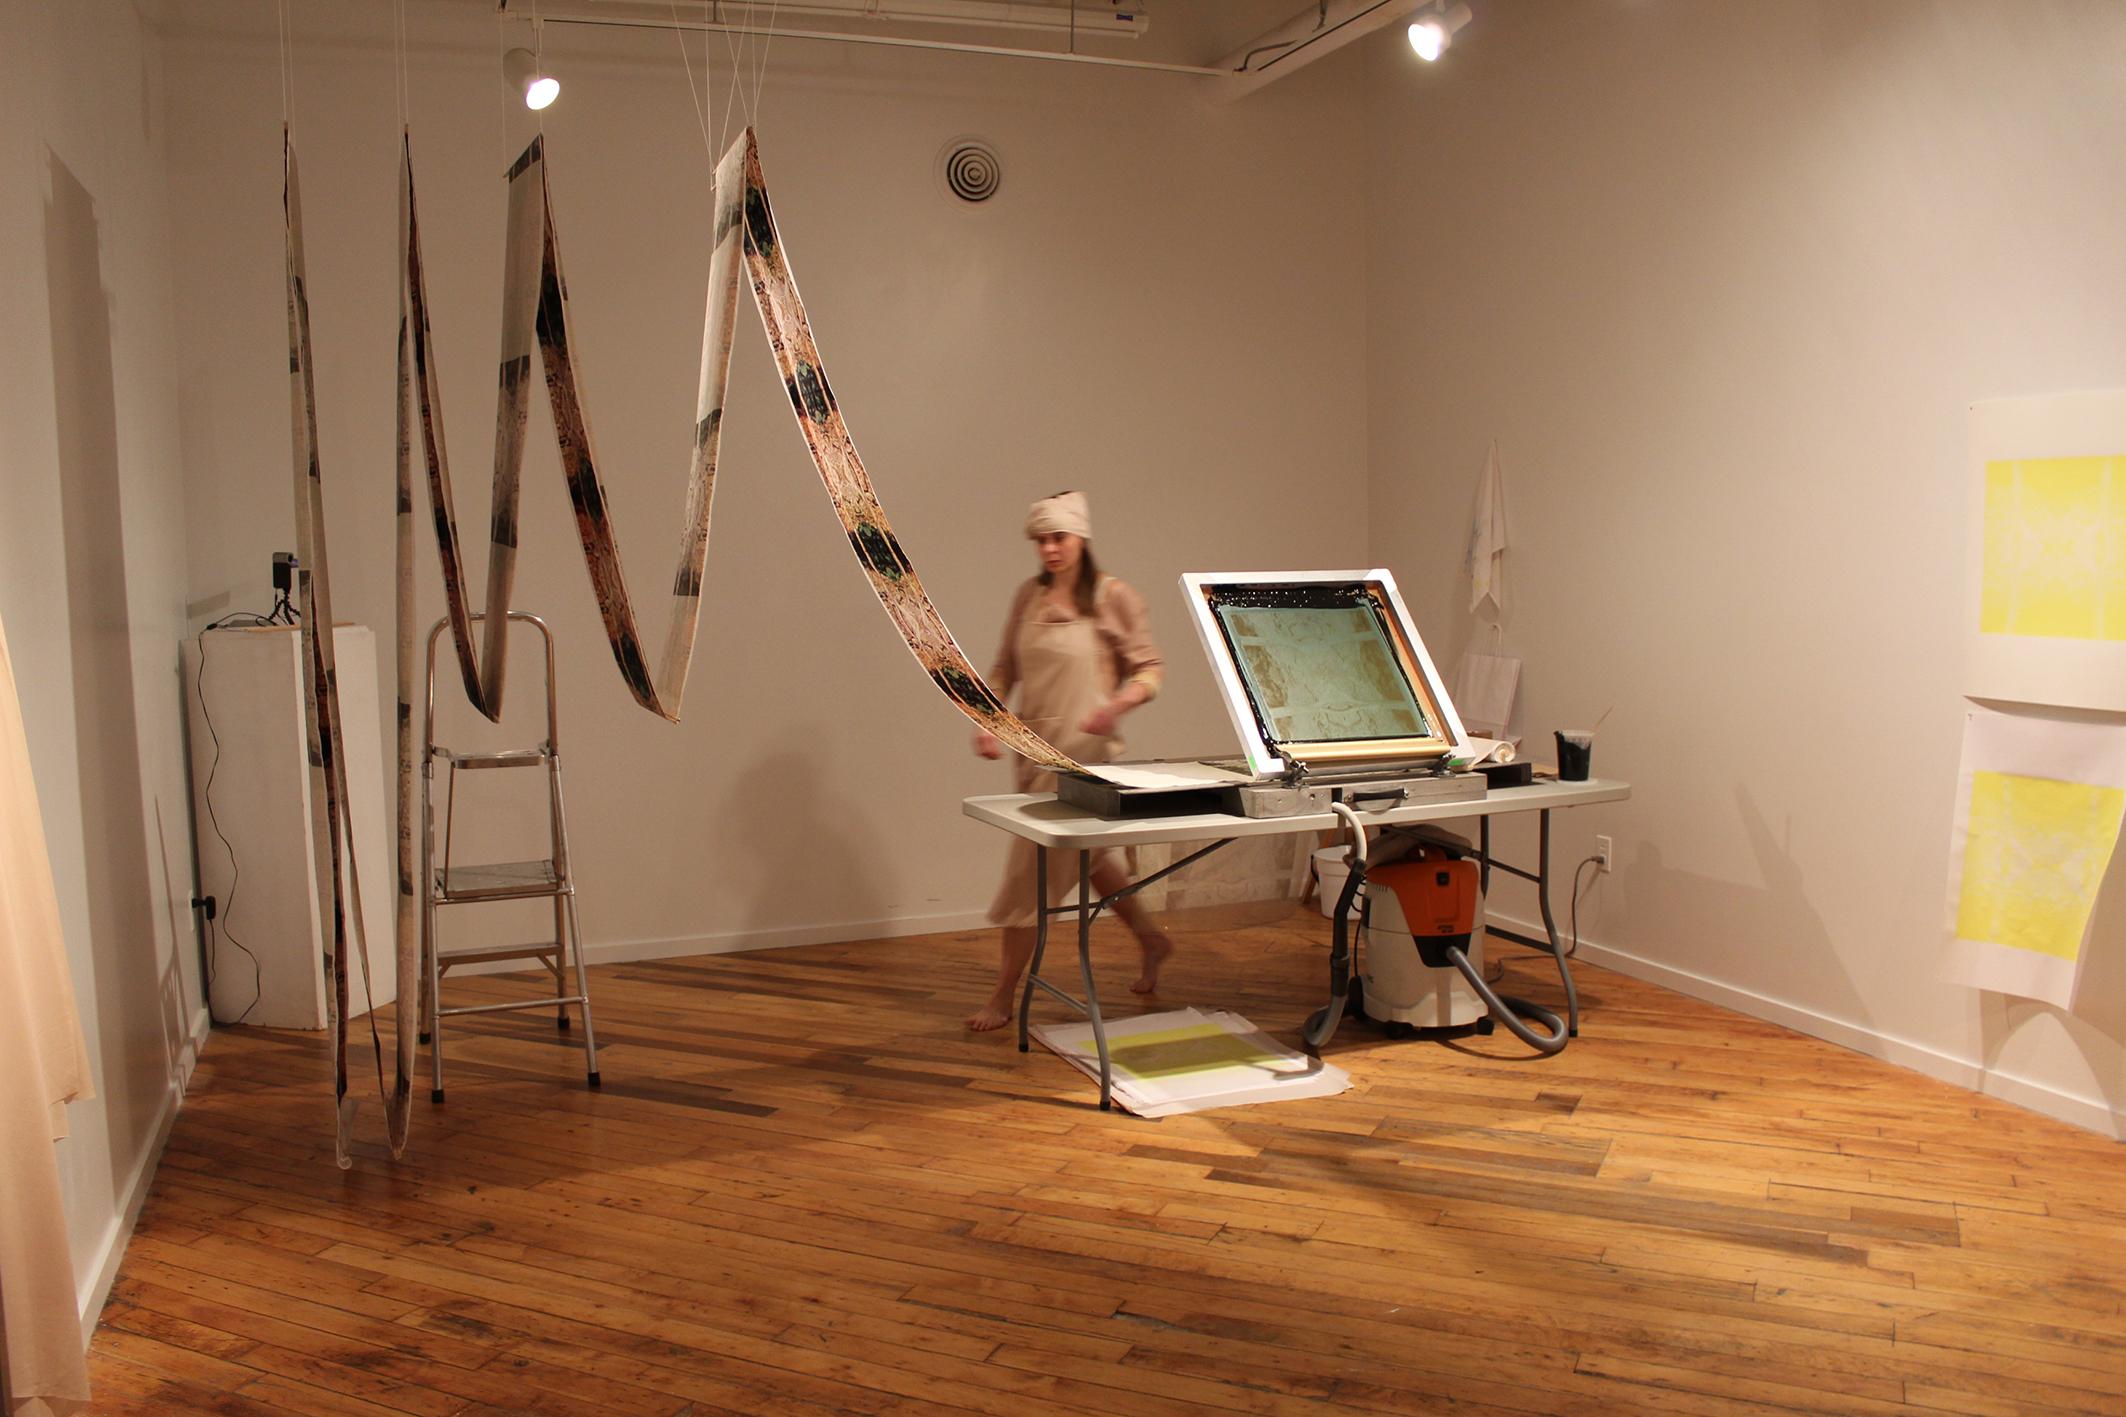 Sirkku Ketola, A Body Called Paula , 2017. Photo: Open Studio, Toronto.